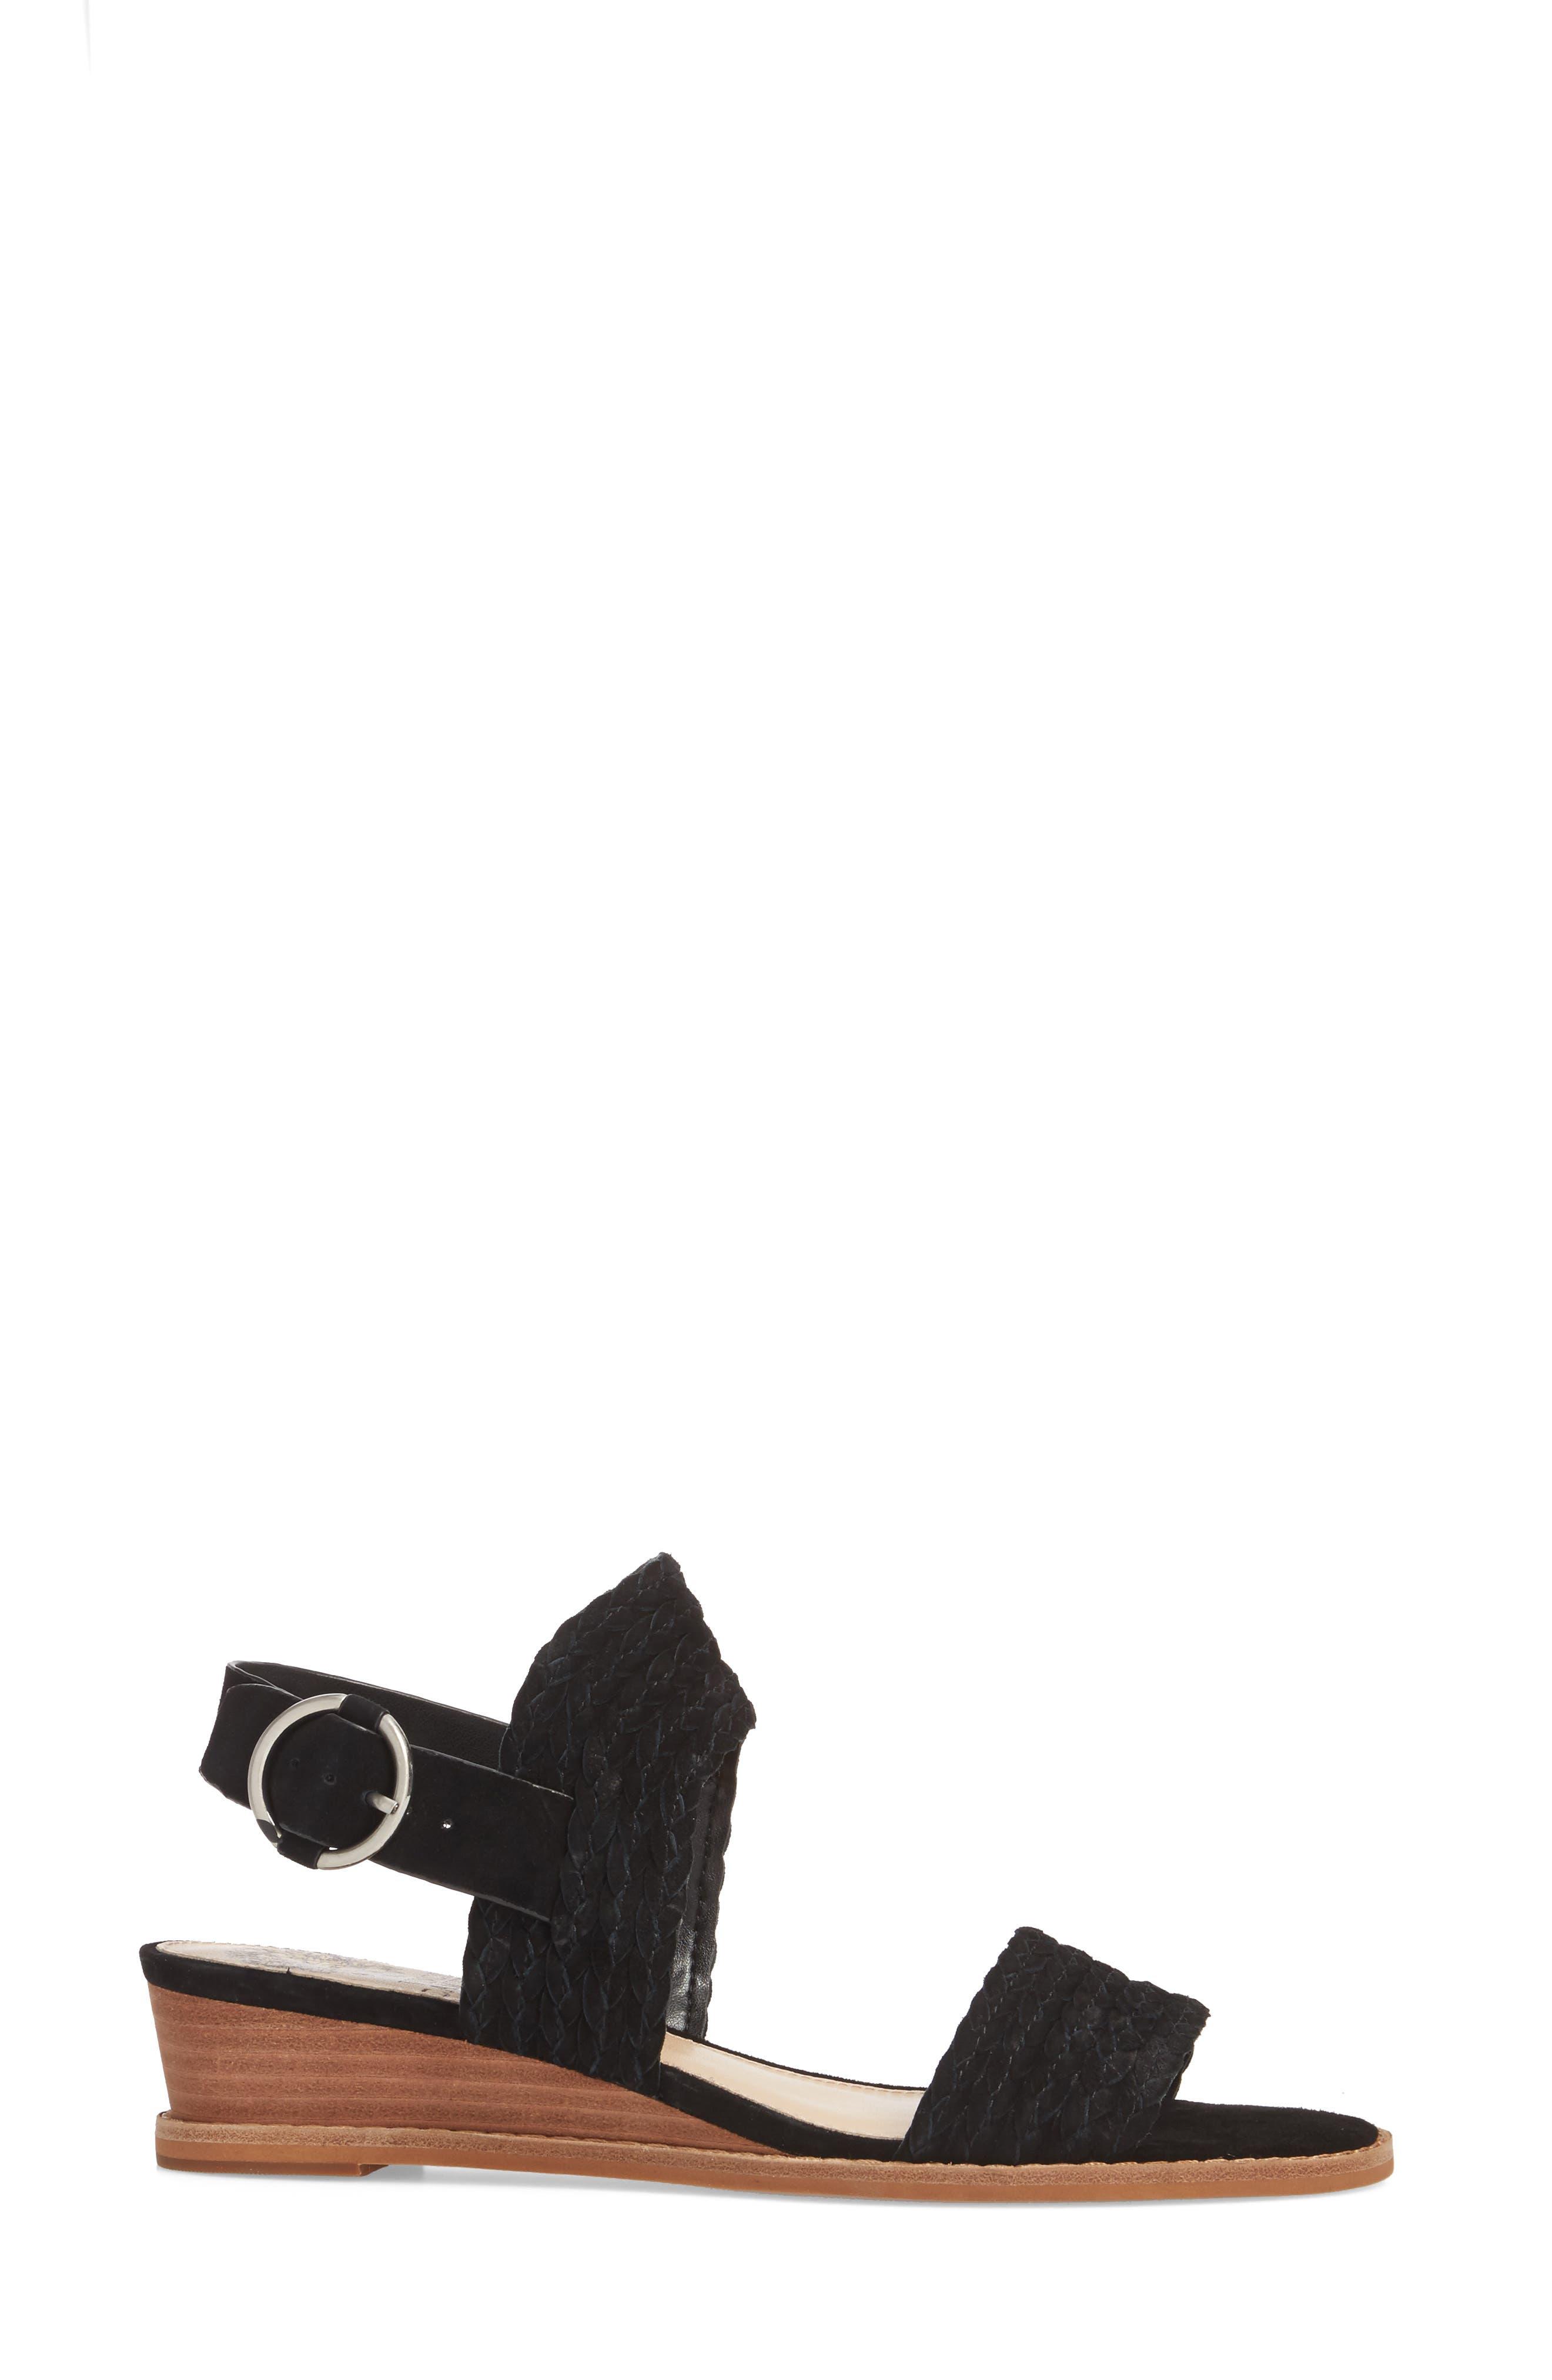 Raner Sandal,                             Alternate thumbnail 3, color,                             BLACK SUEDE